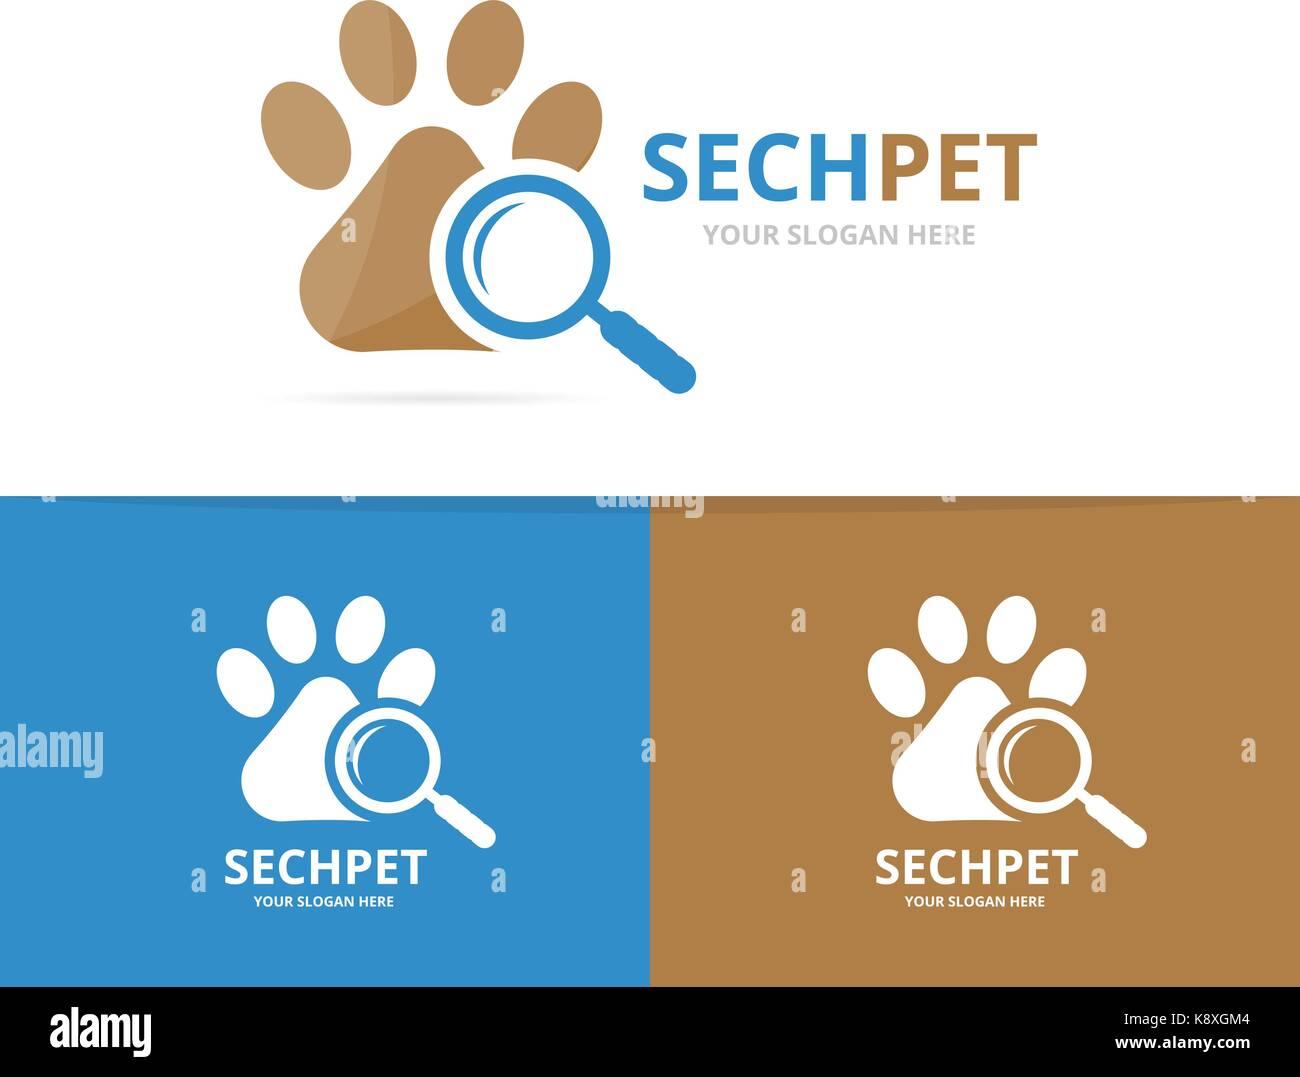 3c21fe1add Service Animal Logo Fotos & Service Animal Logo Imagens de Stock - Alamy